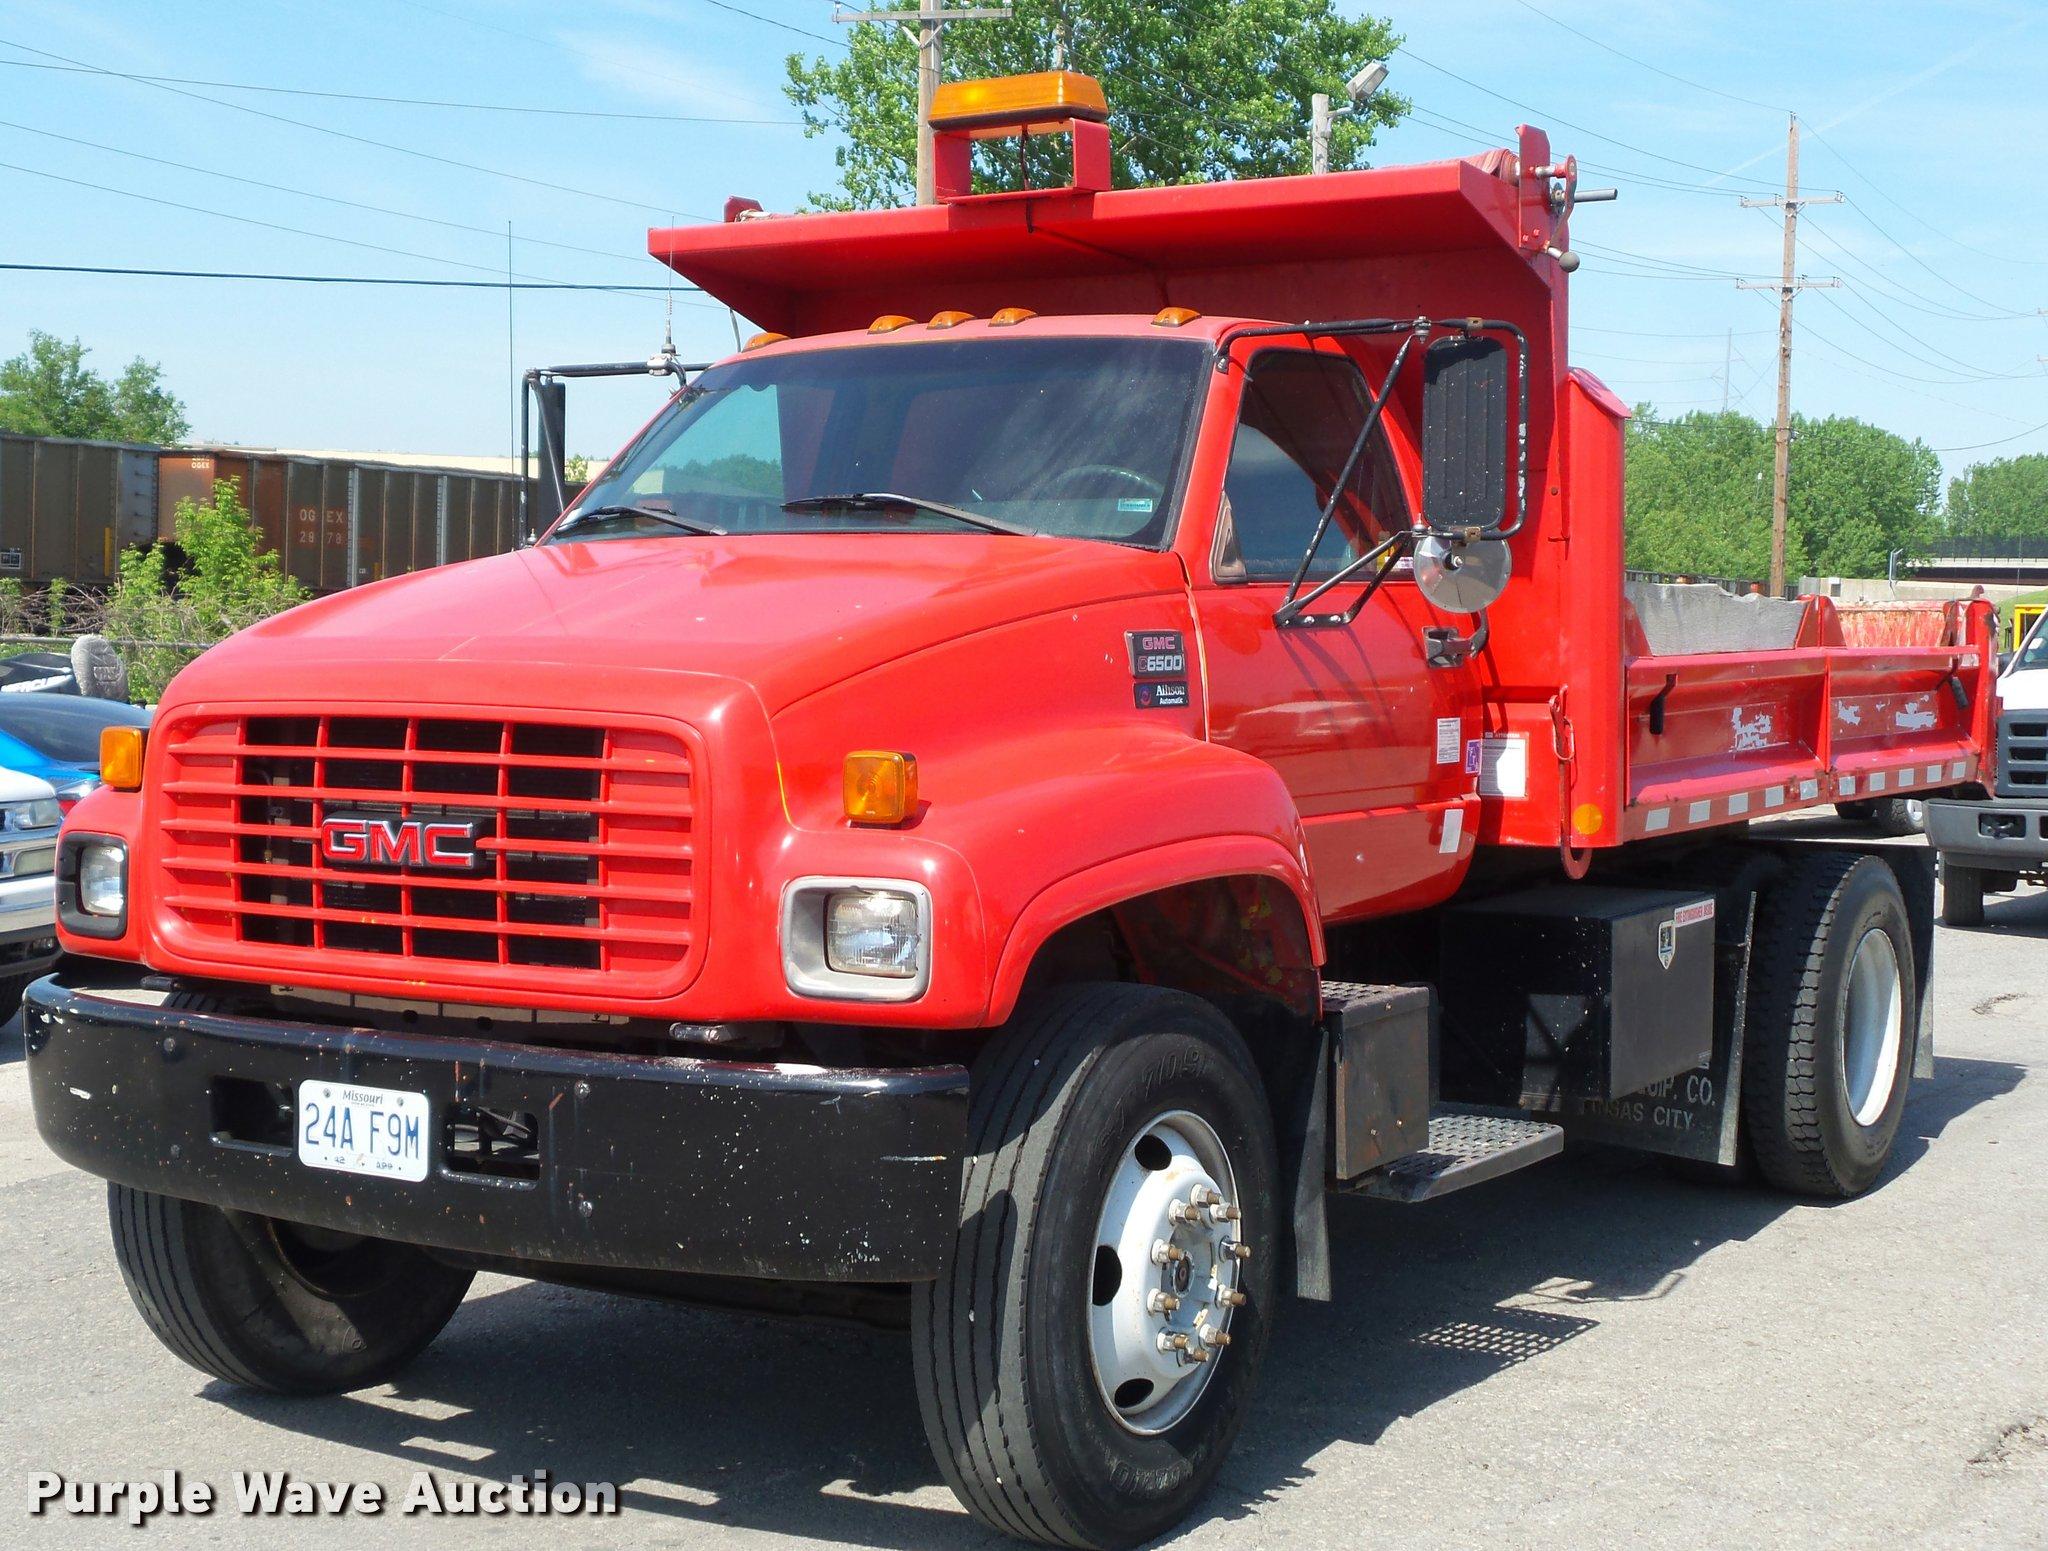 2001 gmc c6500 dump truck item dd9478 sold june 22 cons rh purplewave com C6500 Rollback 2001 GMC C6500 Transmission